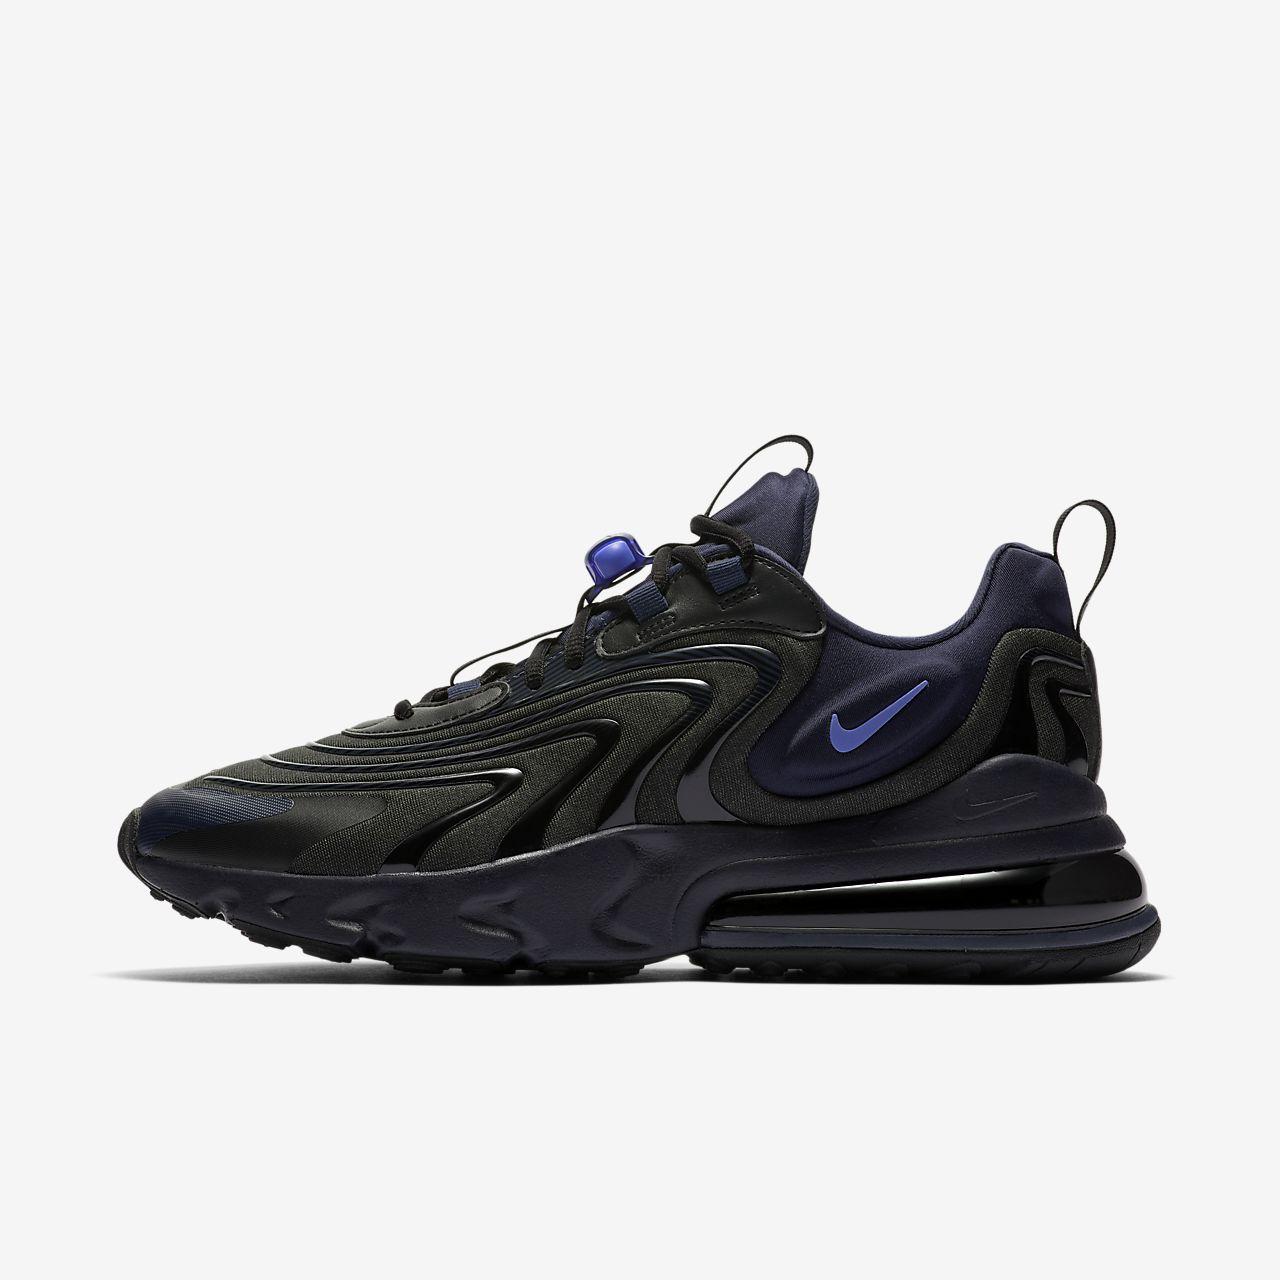 Nike Air Max 270 React ENG-sko til mænd